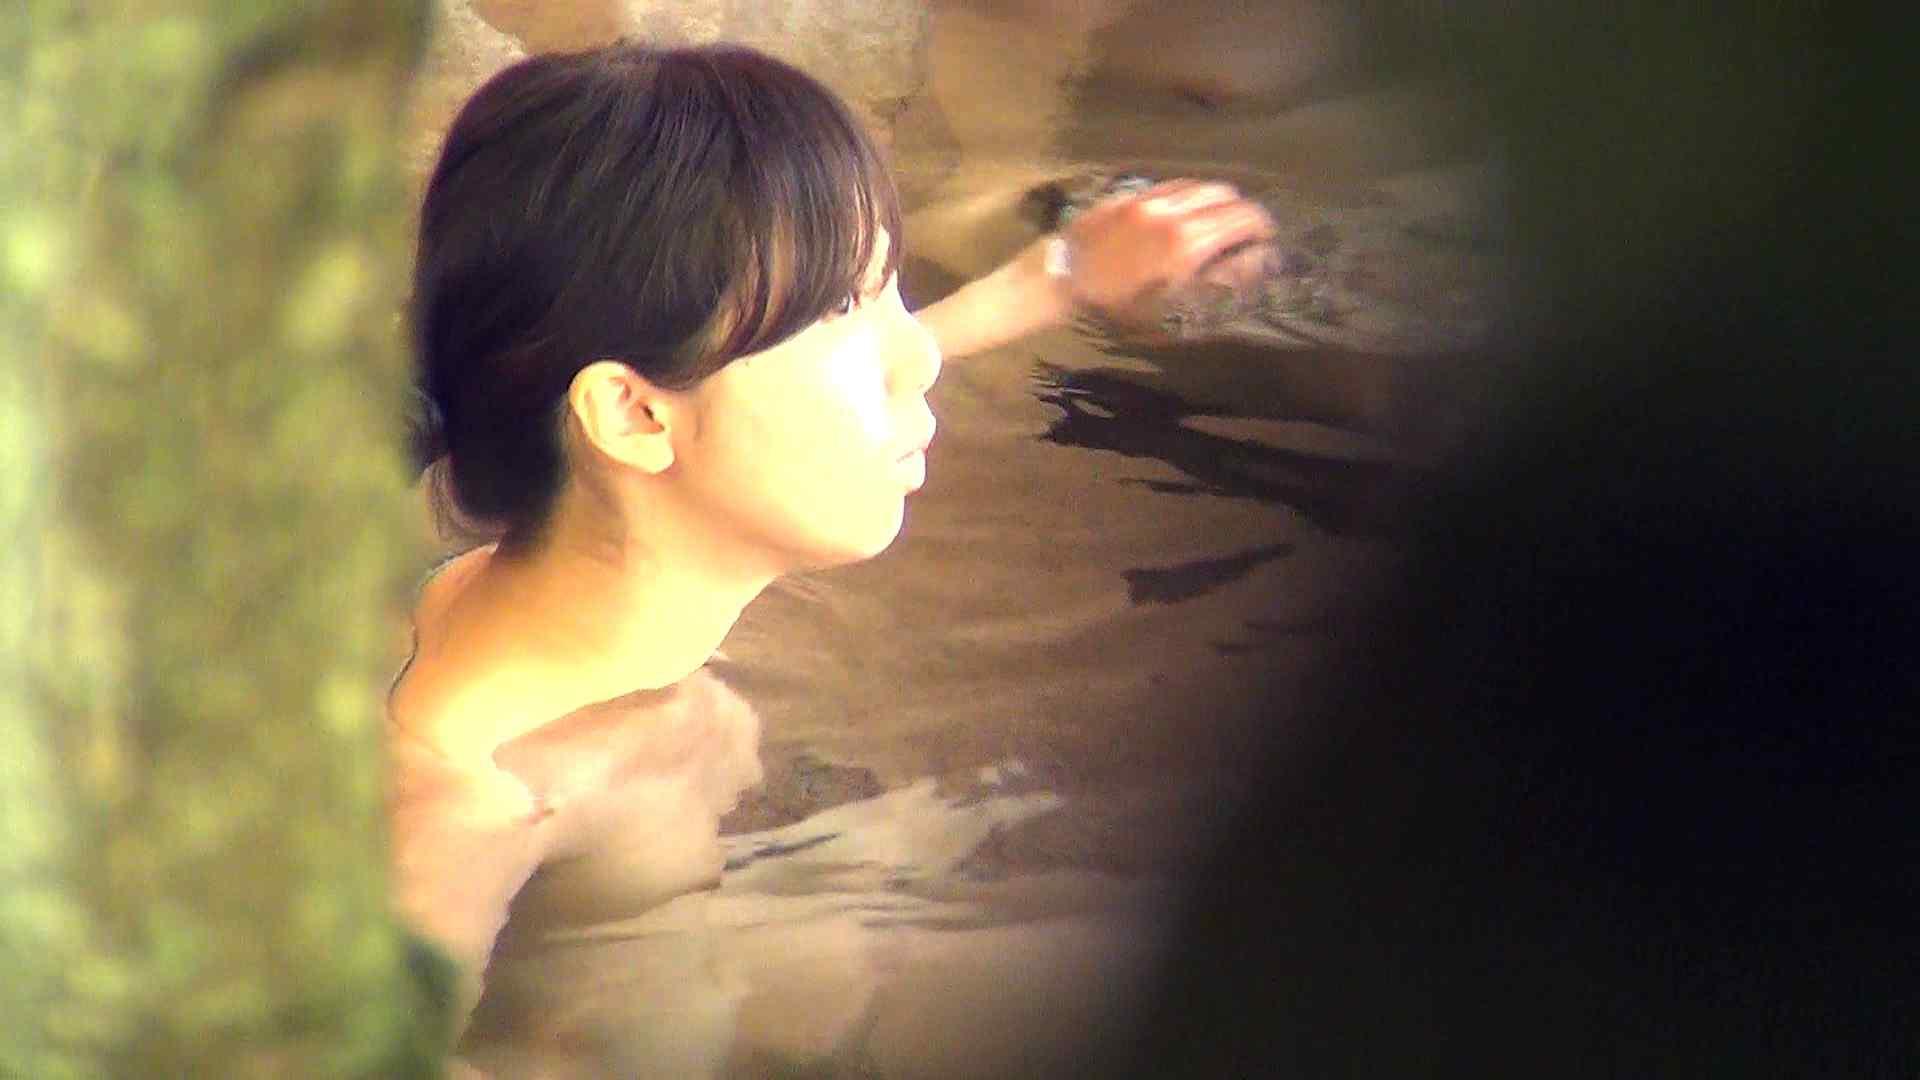 Aquaな露天風呂Vol.285 0 | 0  27連発 6